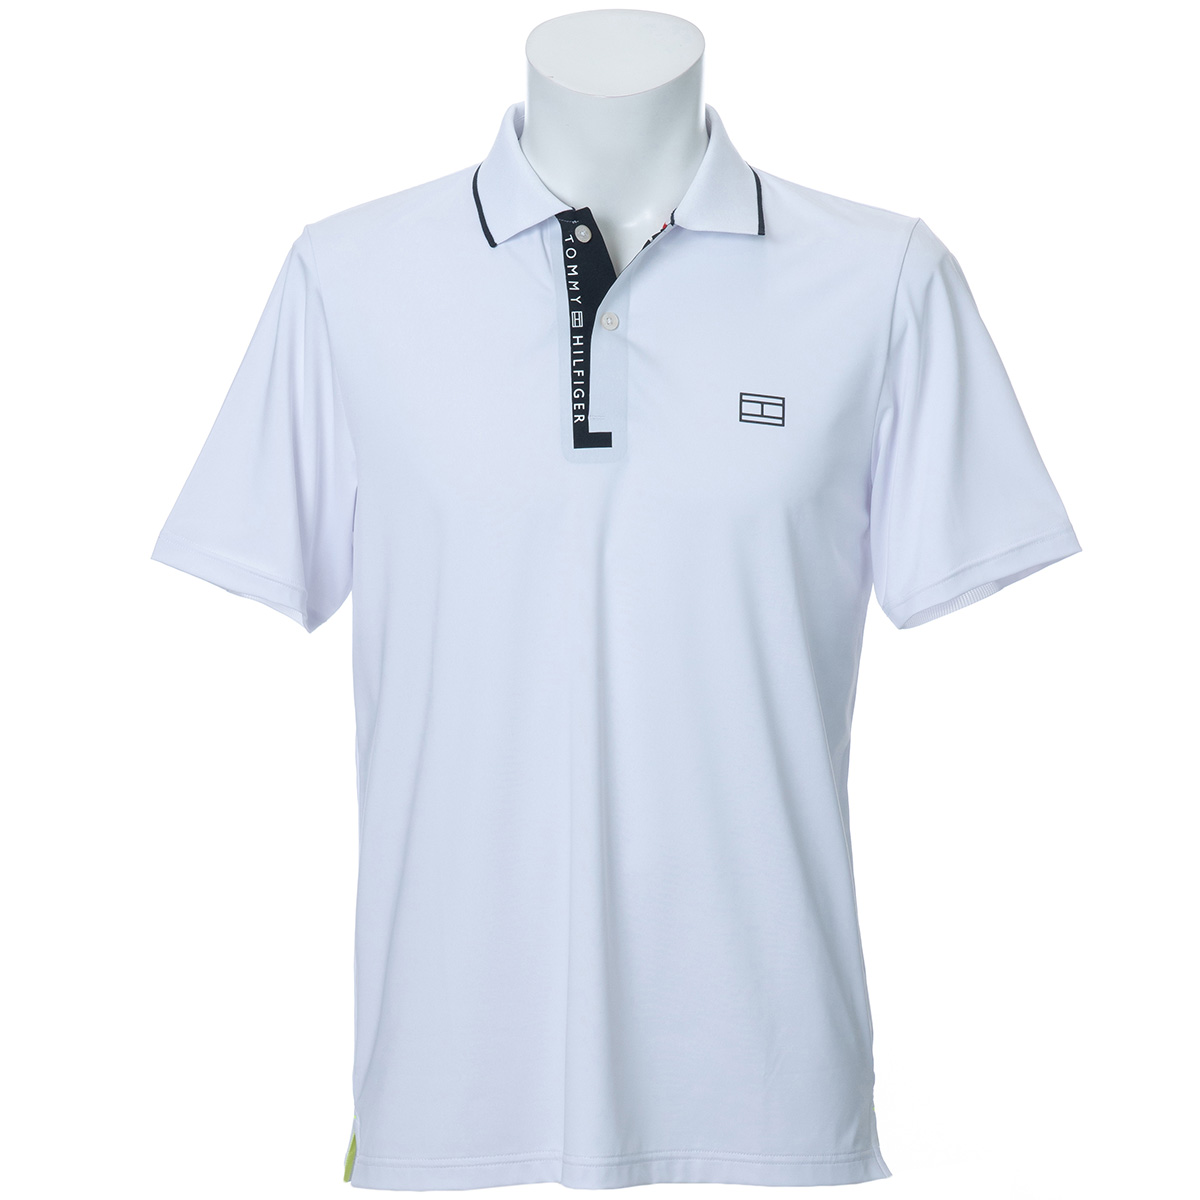 LOWER FLY ロゴ 半袖ポロシャツ